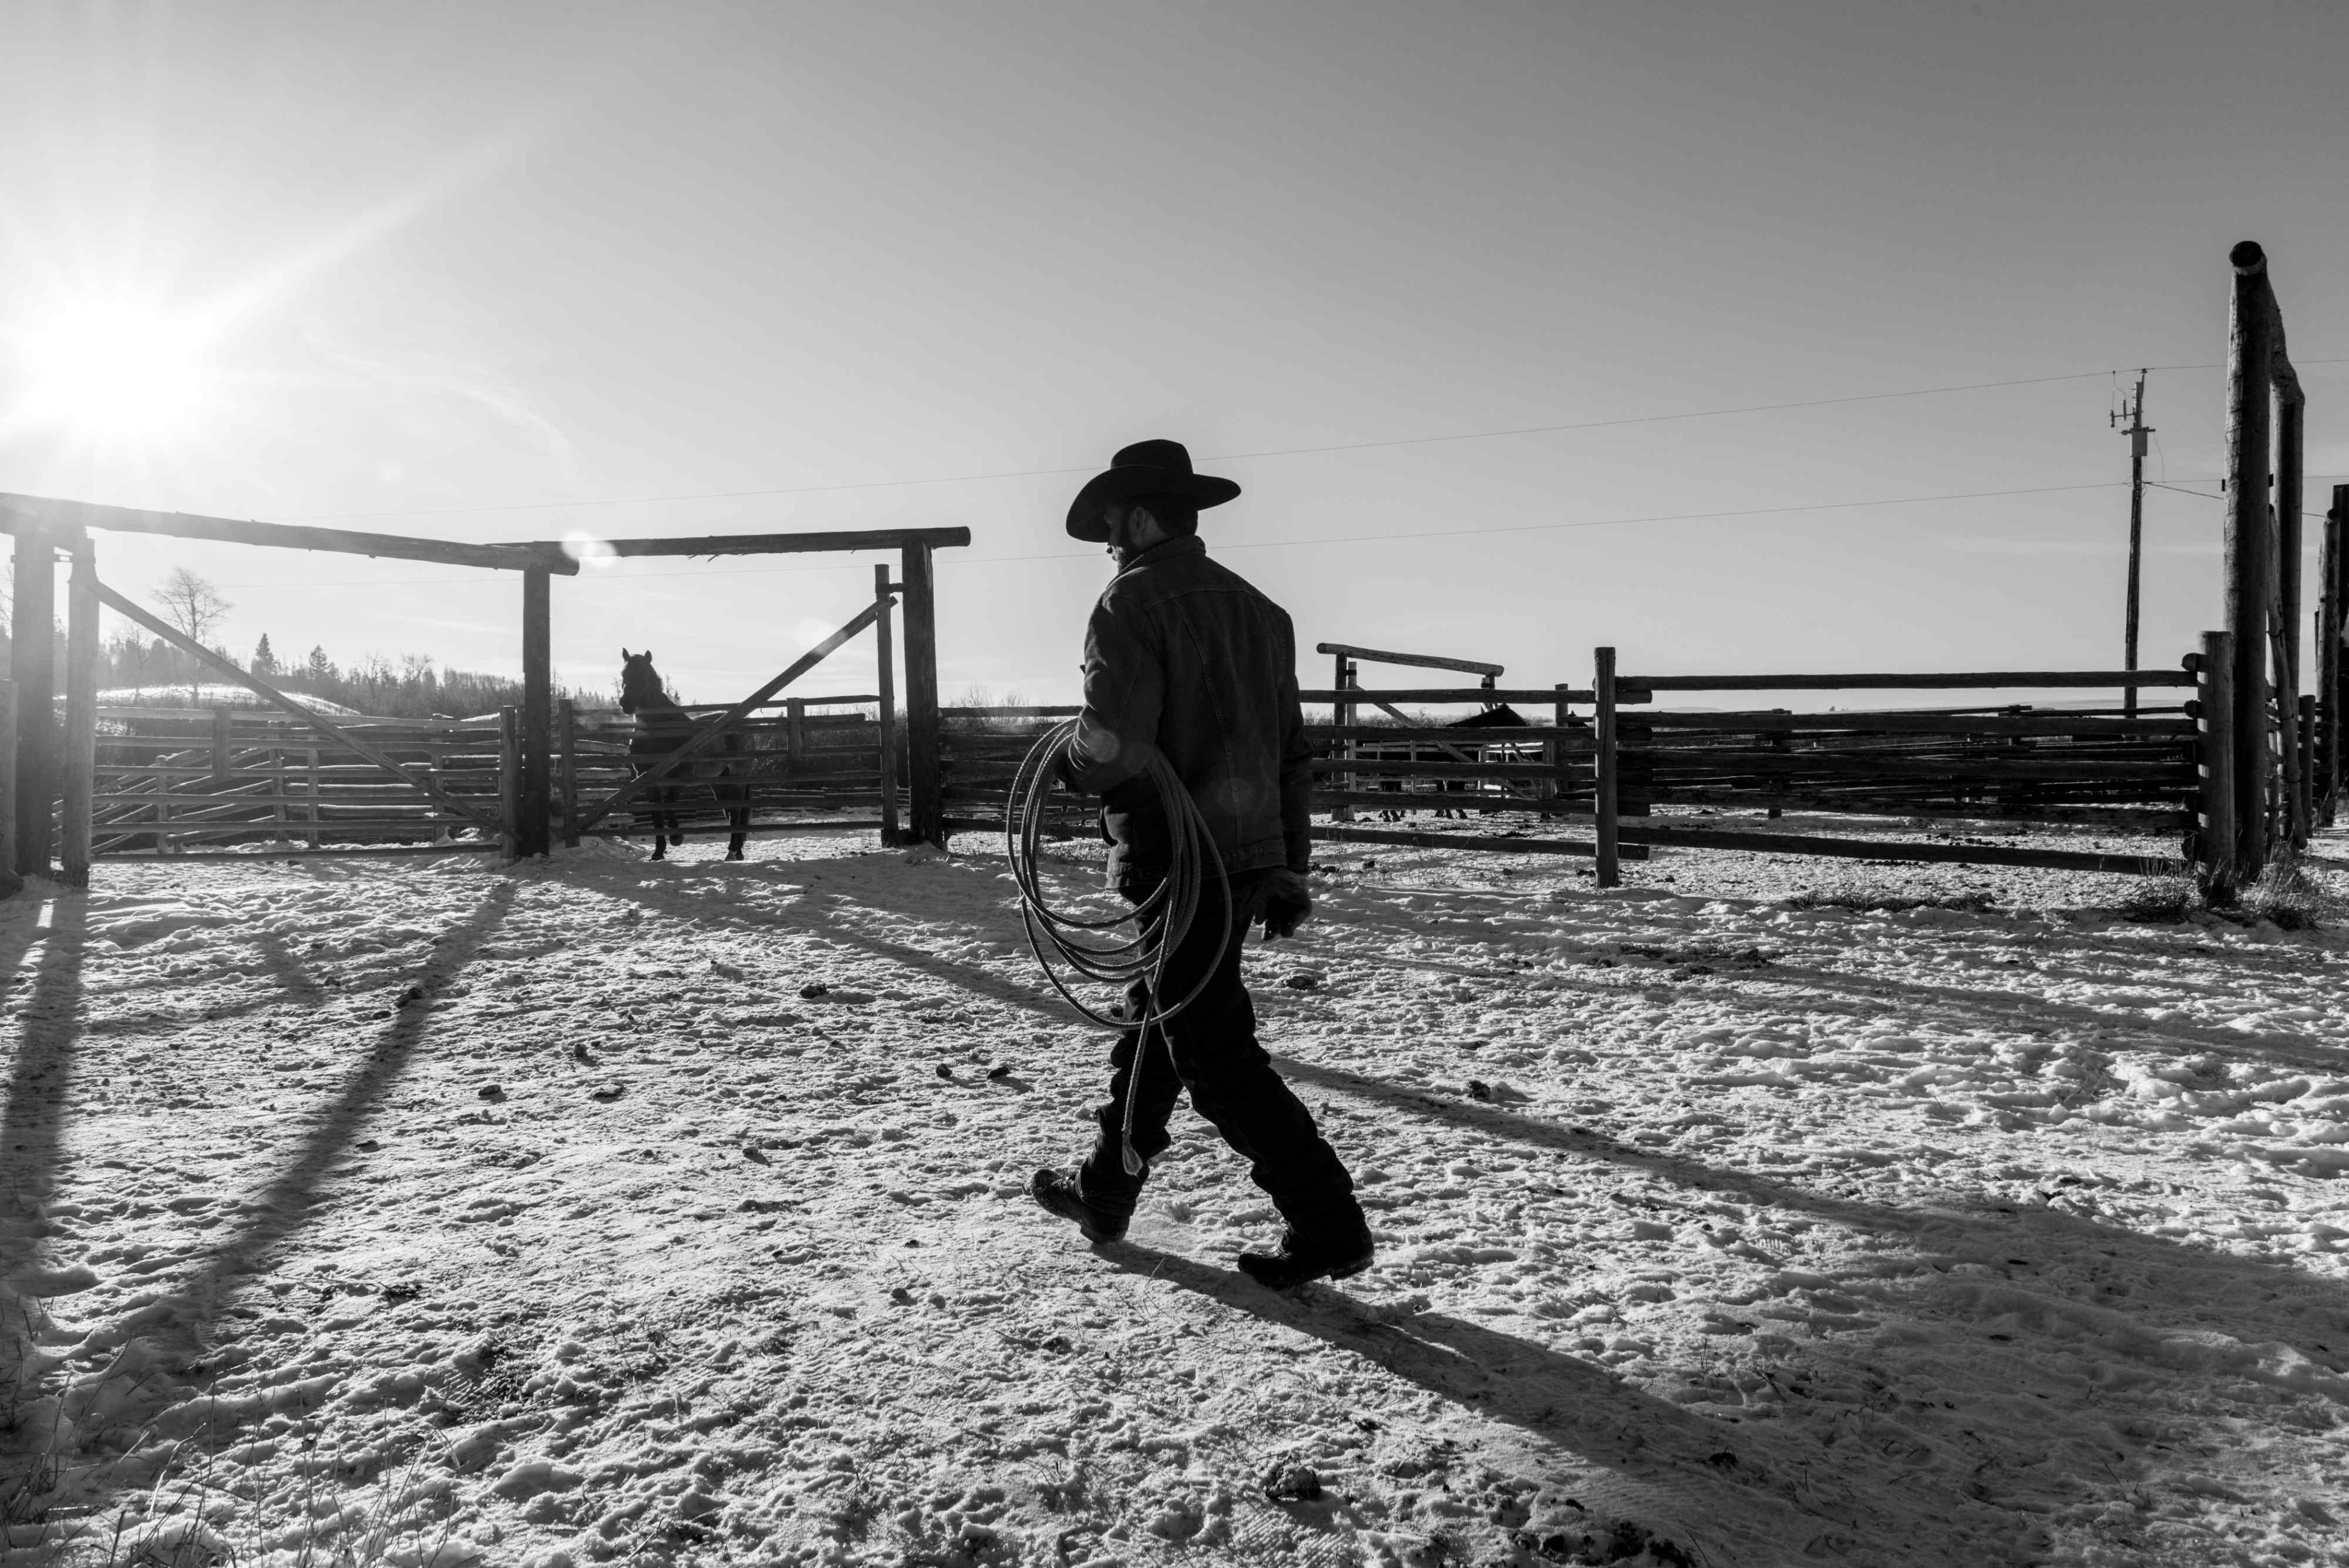 The Last Cowboys of Canada, Daily Edit, Luis Fabini